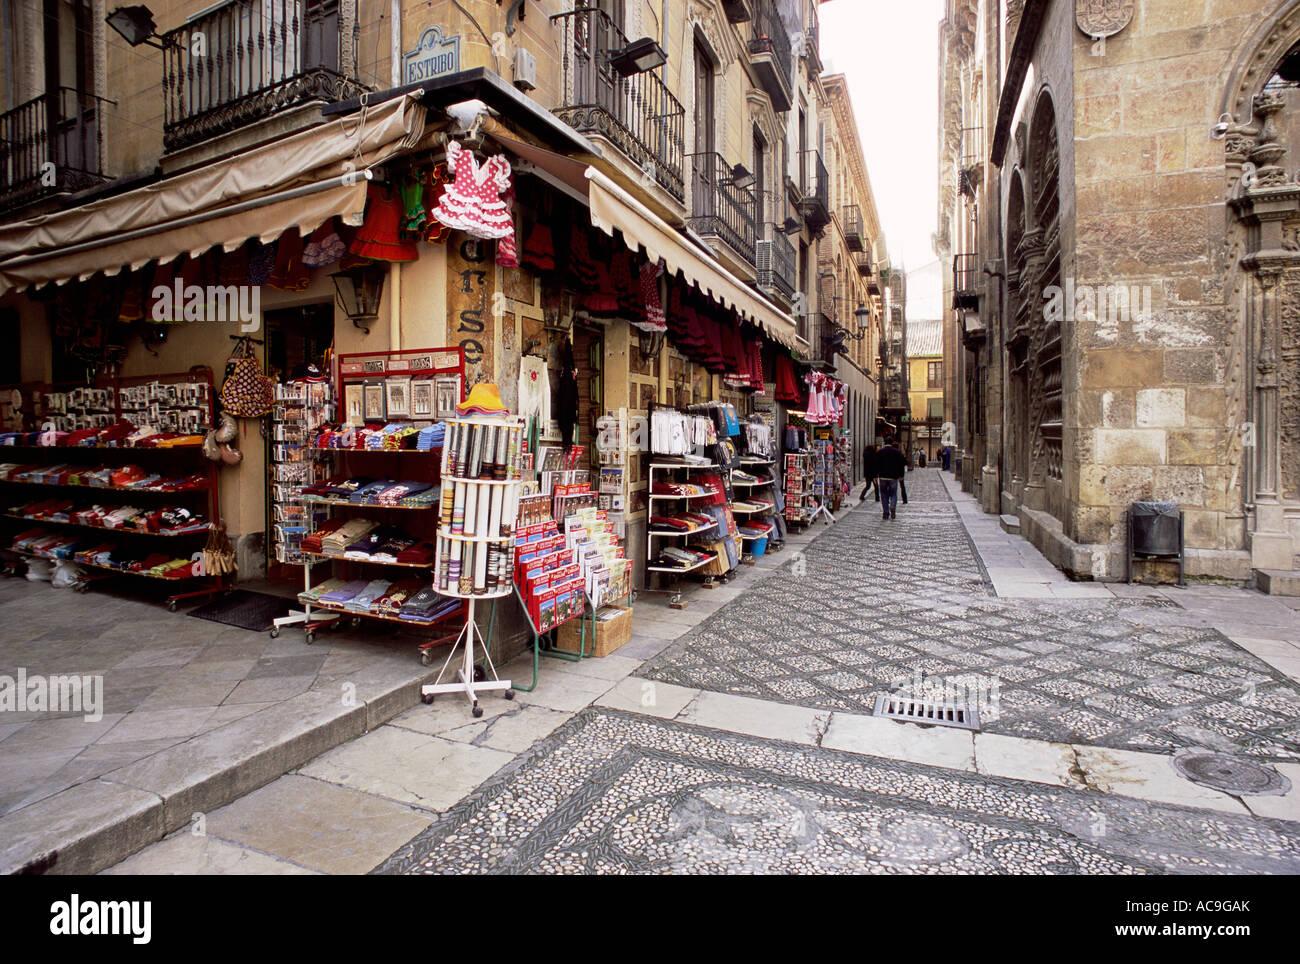 Narrow street and shop in the Alcaiceria moorish quarter of Granada